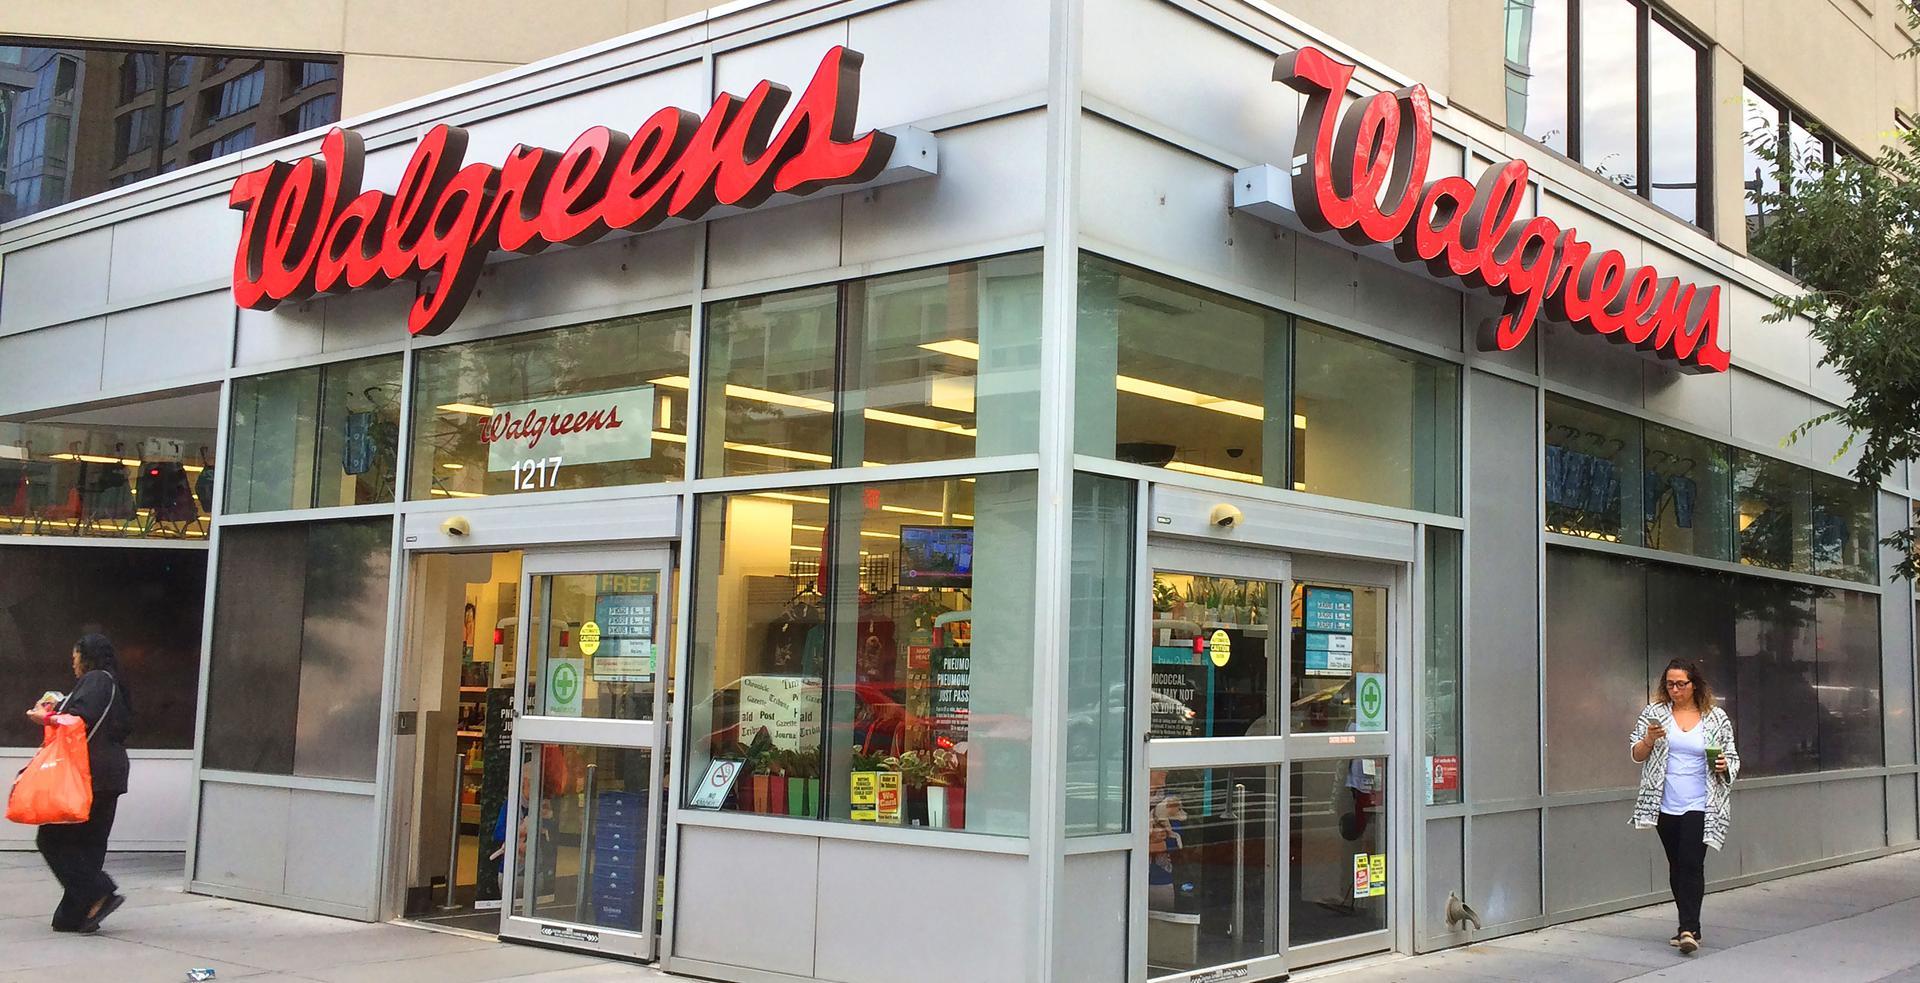 A Walgreens store is seen on June 14, 2016 in Washington,DC. / KAREN BLEIER/AFP via Getty Images